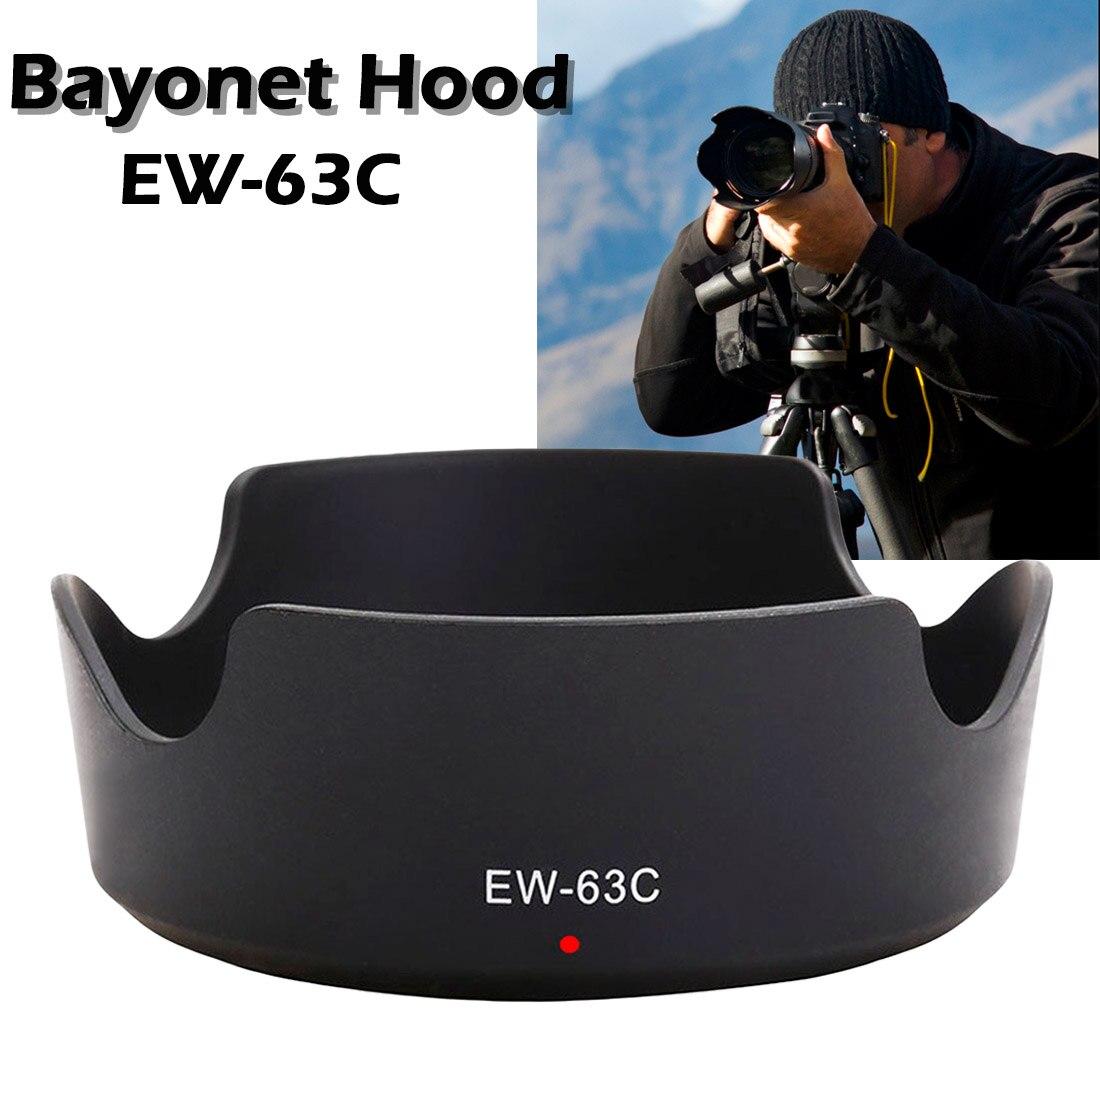 ABS Lens Hood EW-63C EW63C For Canon EF-S 18-55mm F/3.5-5.6 IS STM 58mm Camera Lens Hood Lens Protetor Ew 63c